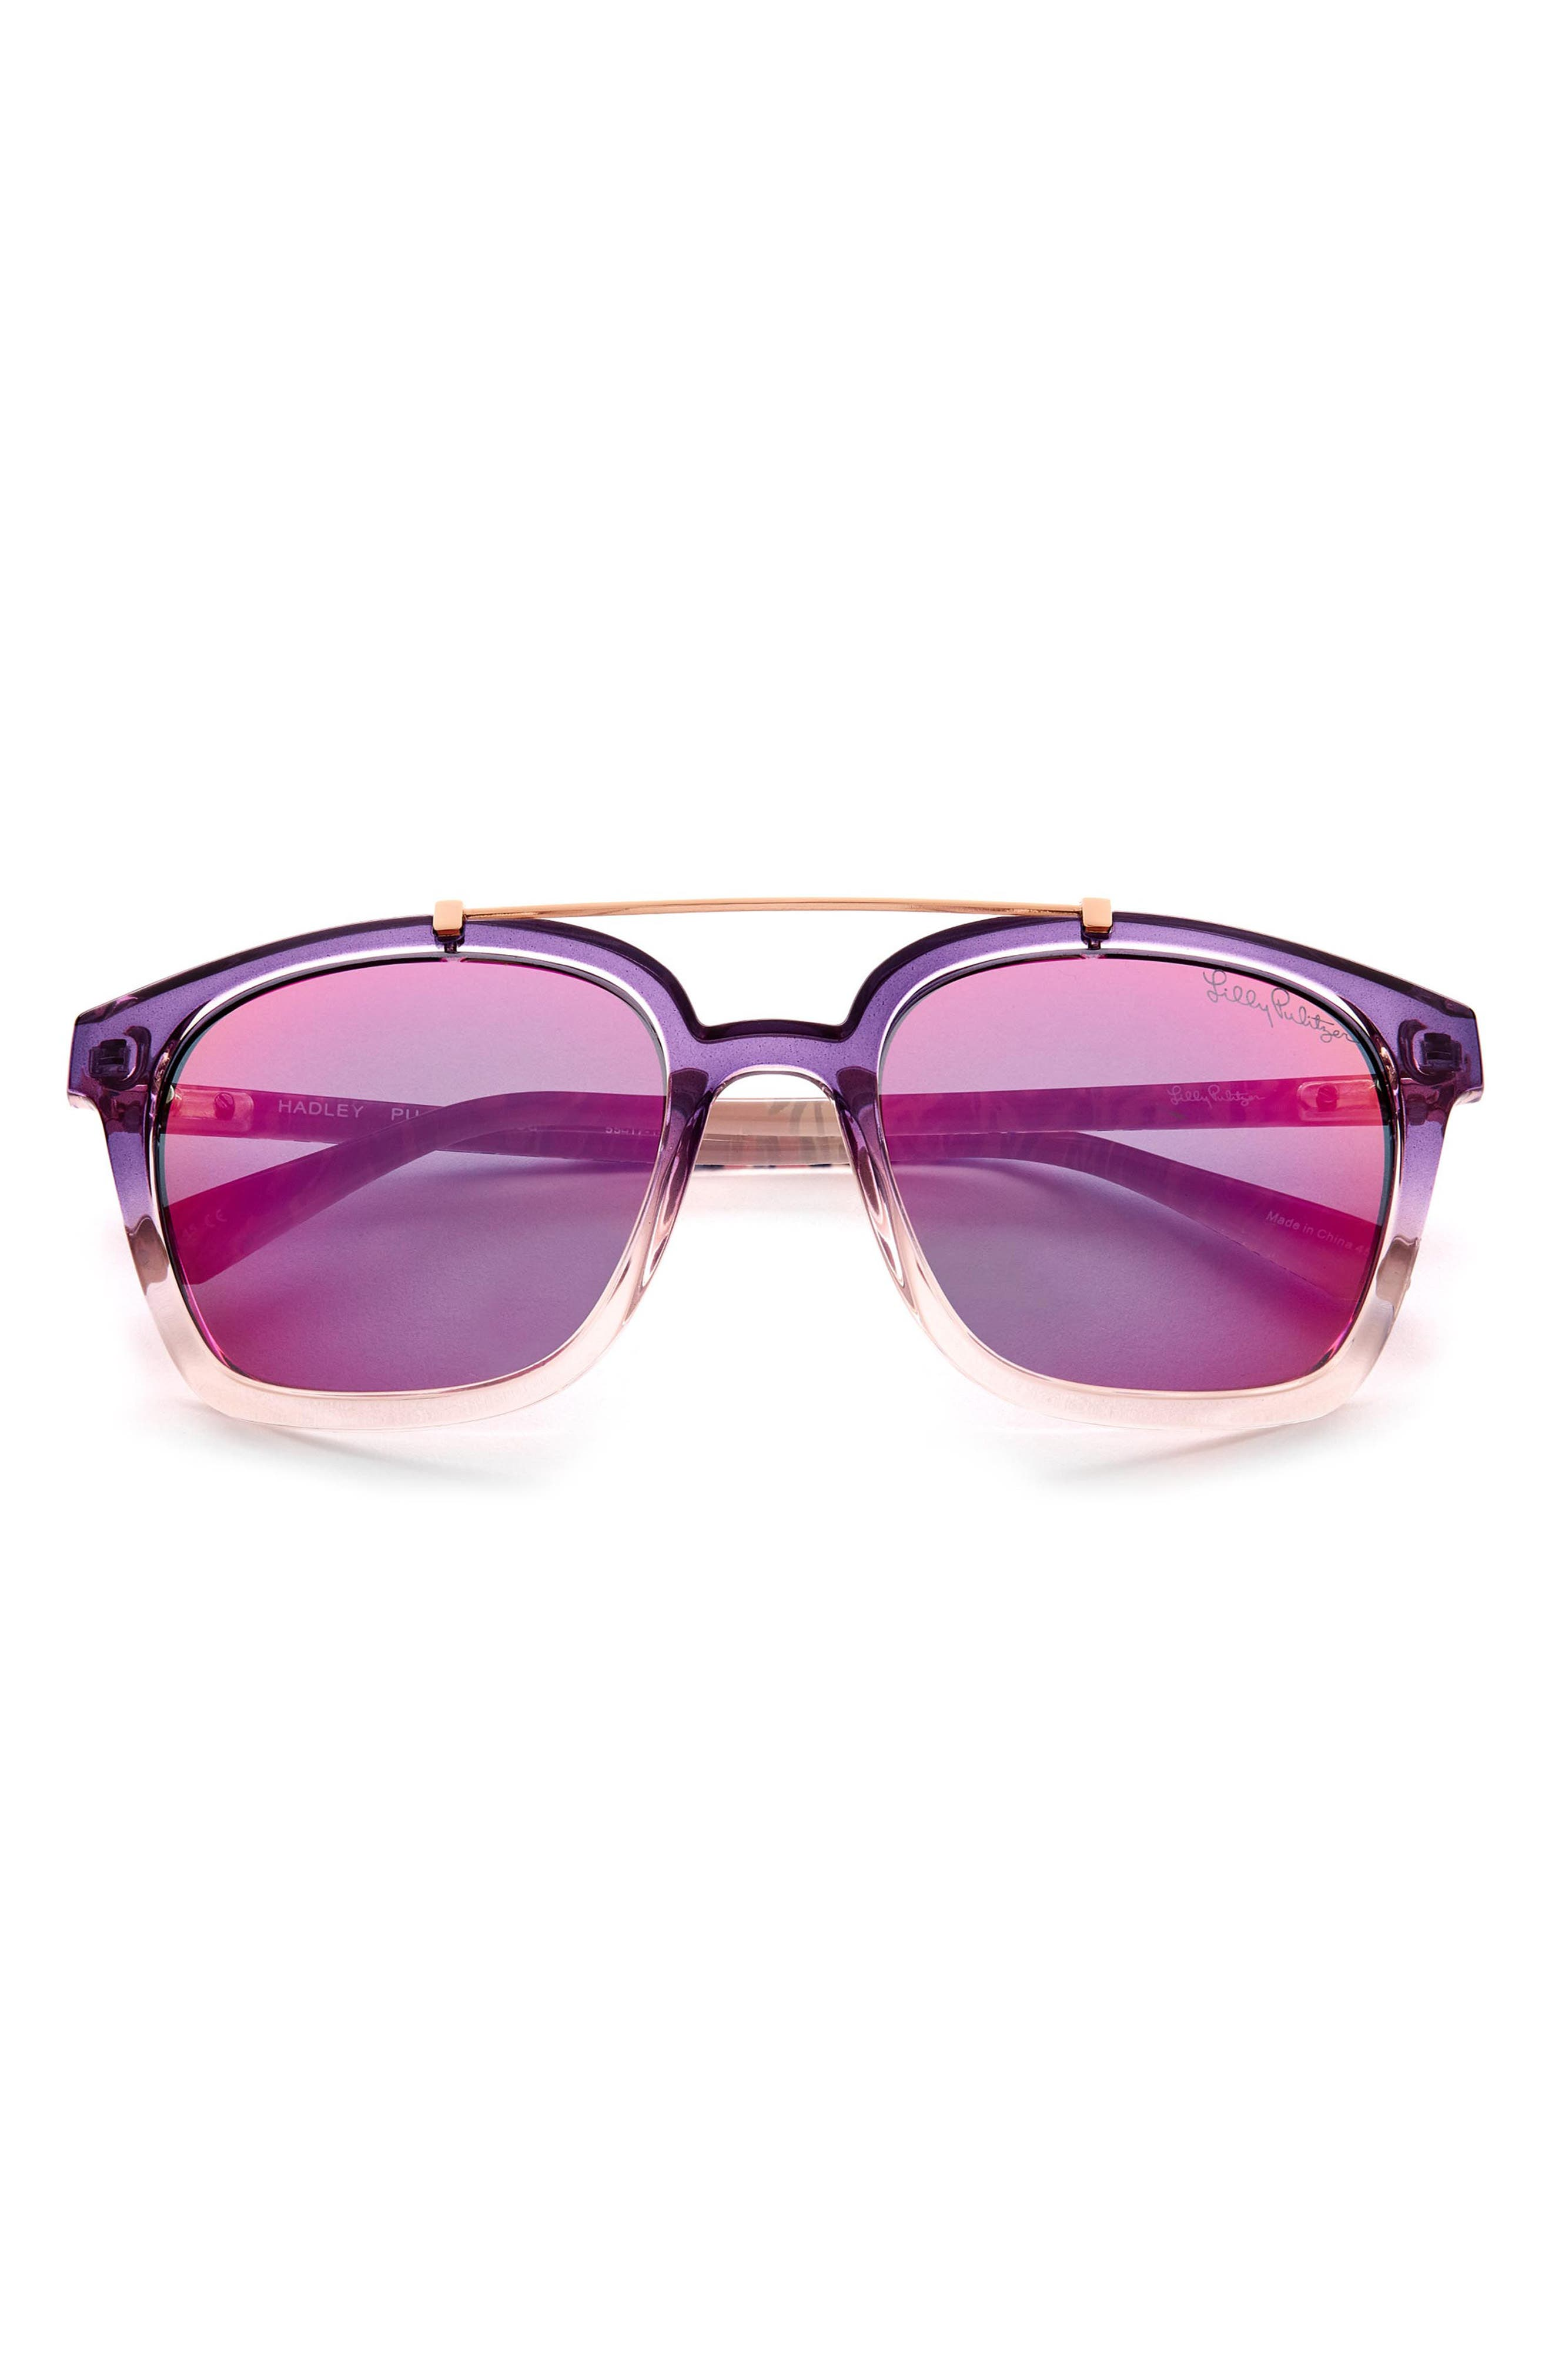 Women's Lilly Pulitzer 54mm Polarized Aviator Sunglasses